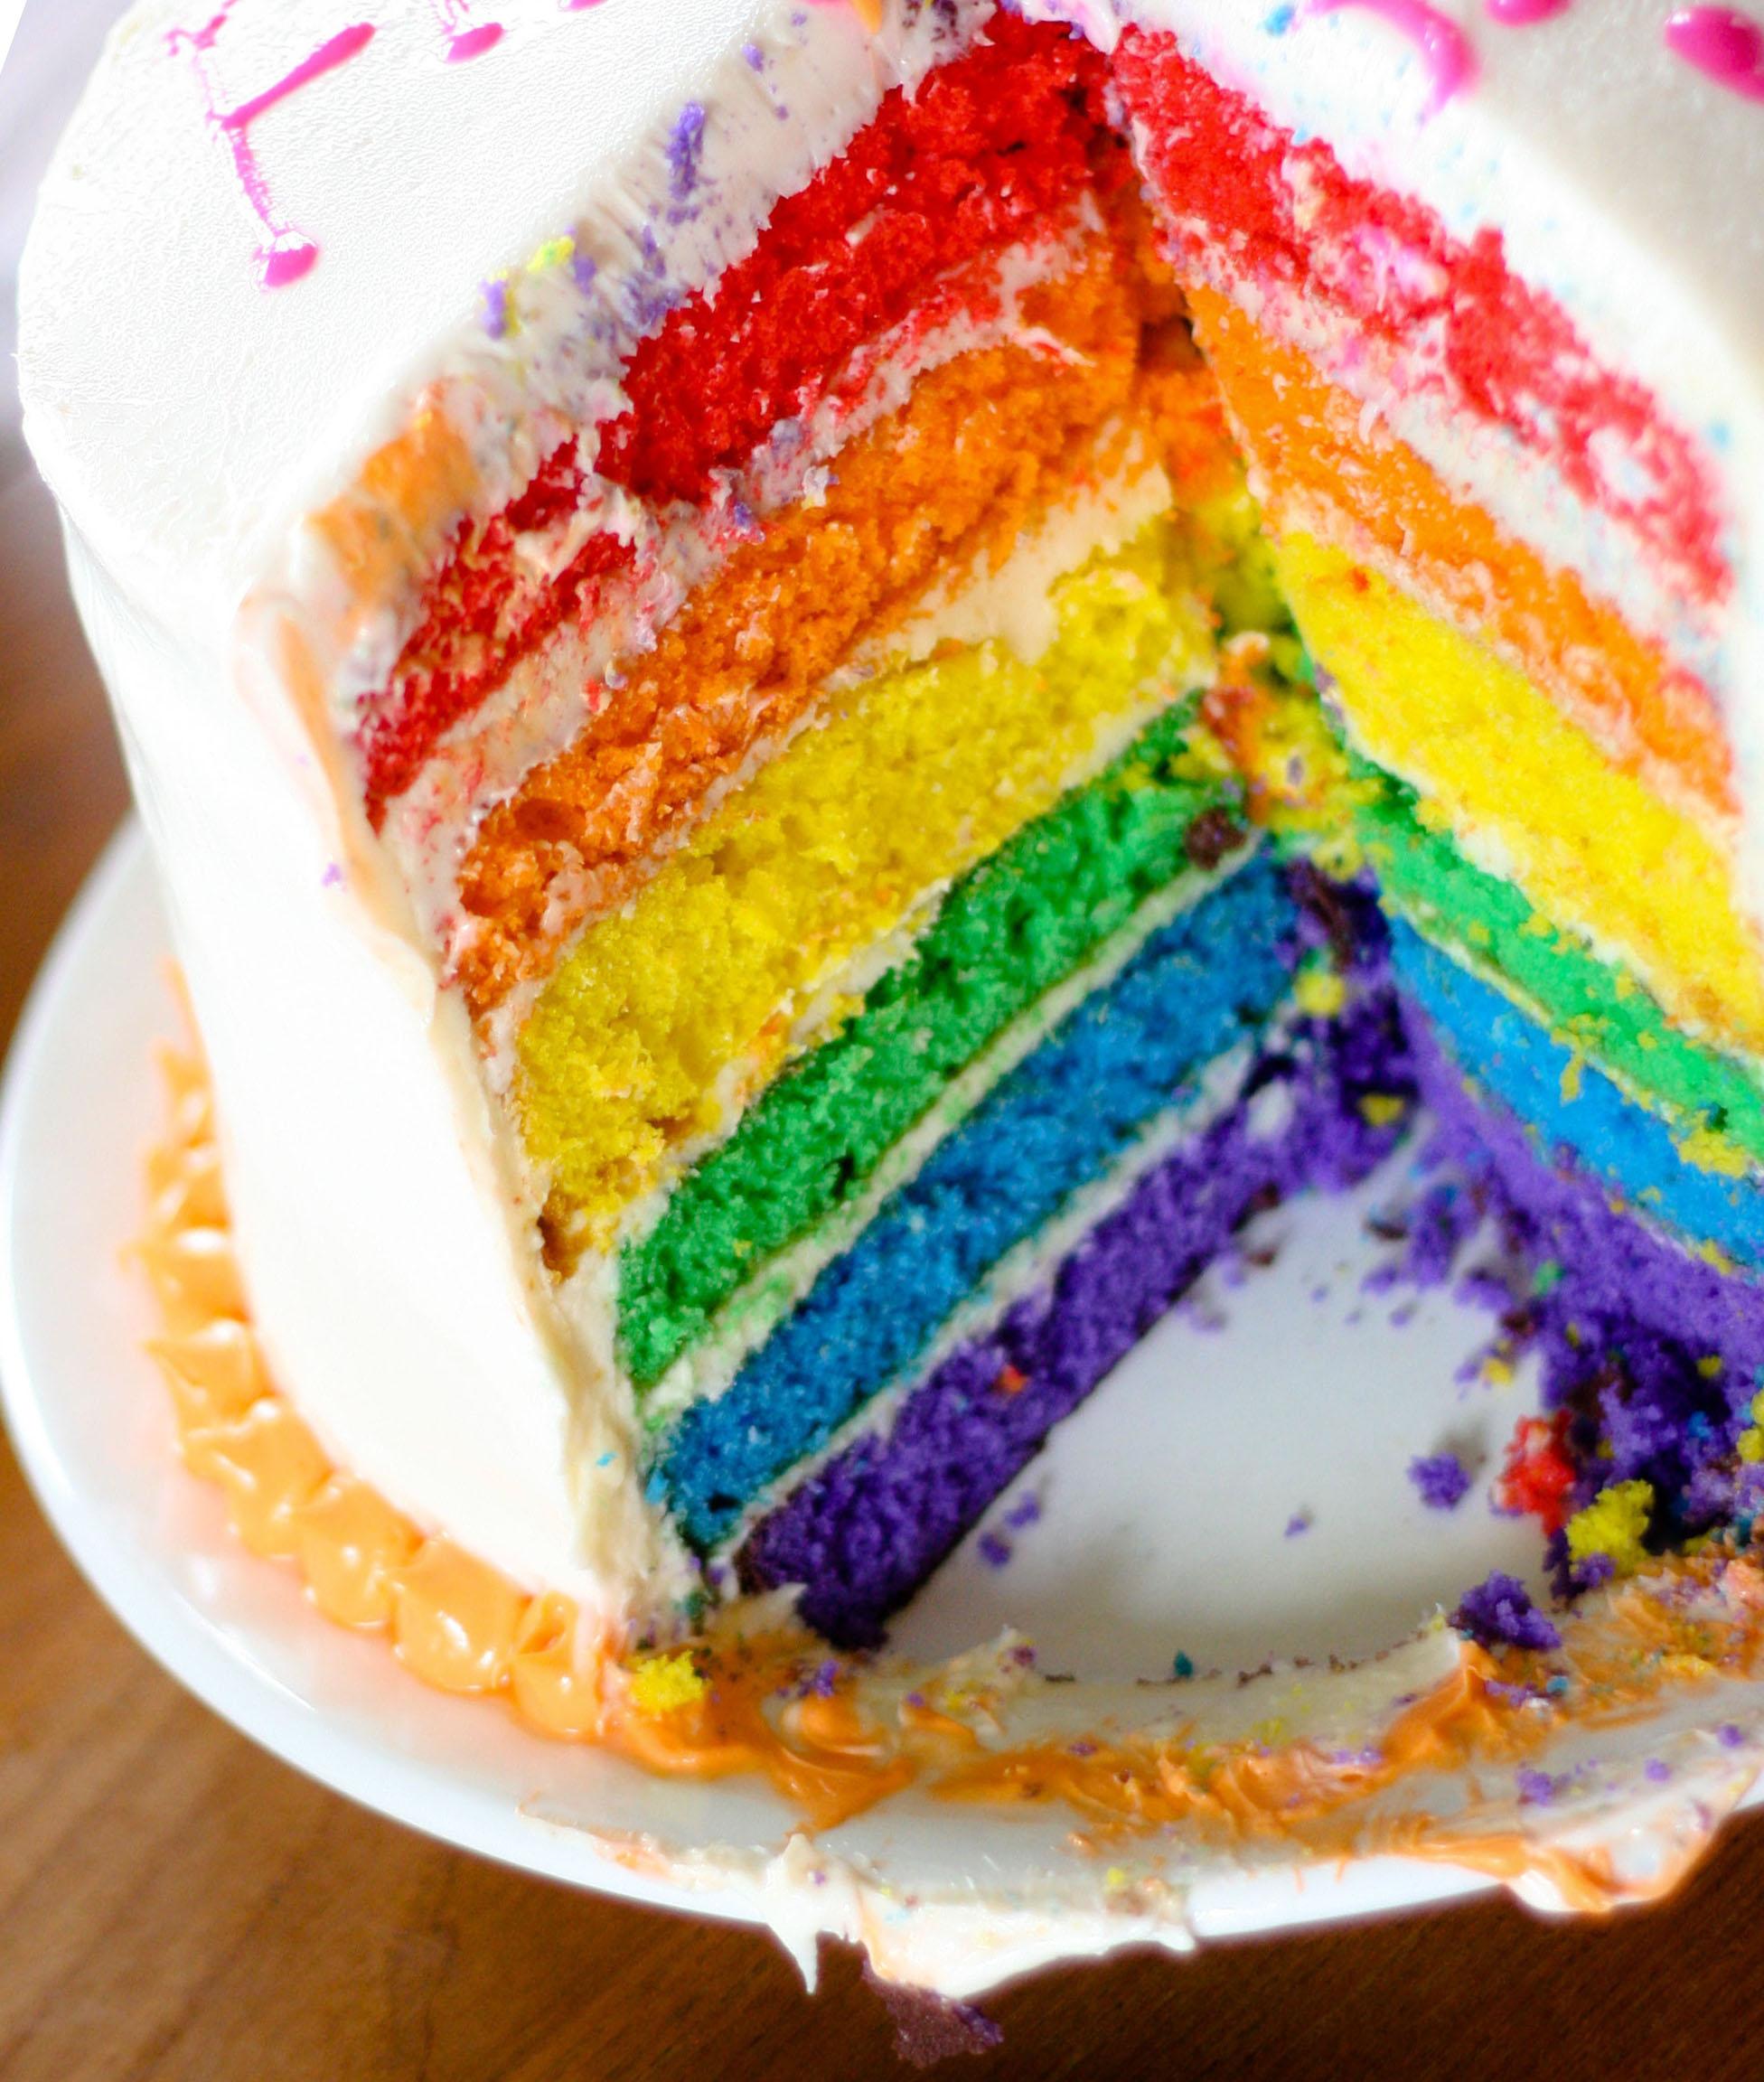 Rainbow Cake | Tasty Kitchen: A Happy Recipe Community!